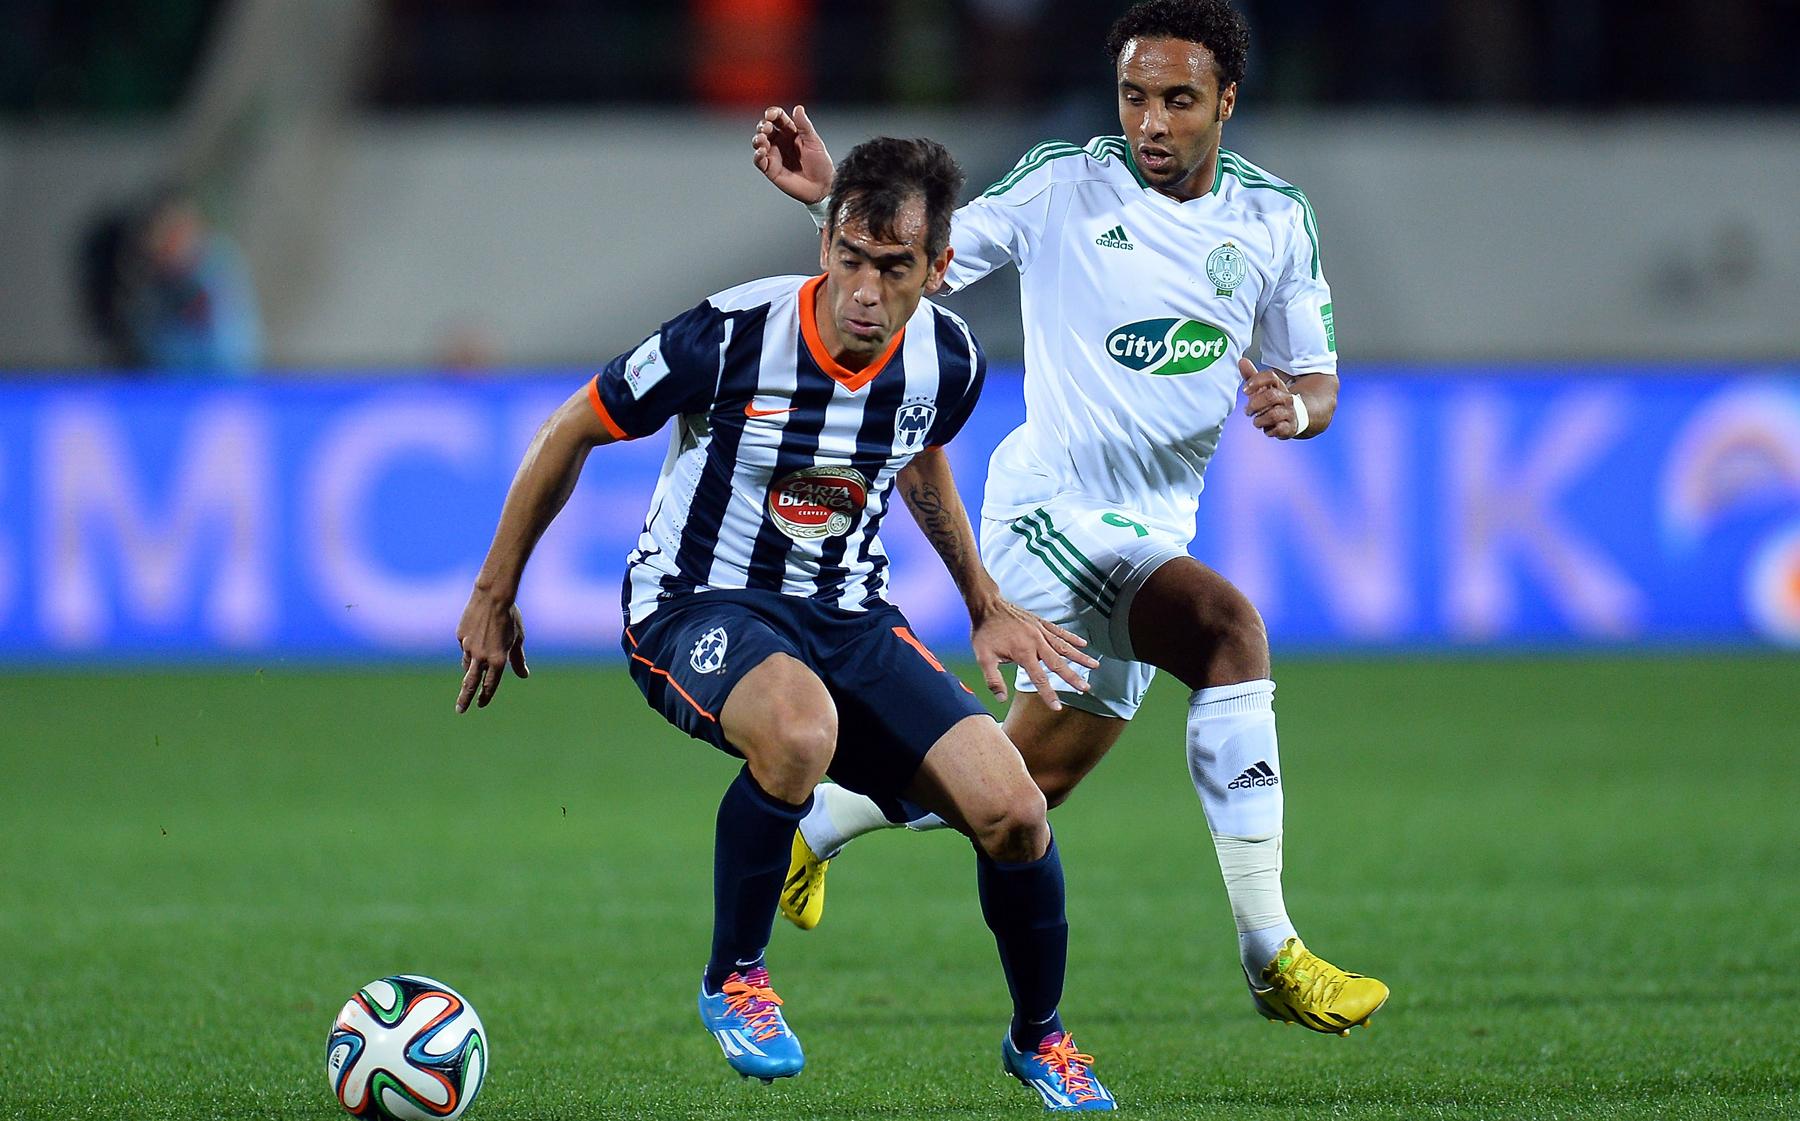 Cesar Delgado of Monterrey is challenged by Issam Erraki Raja Club World Cup 2013